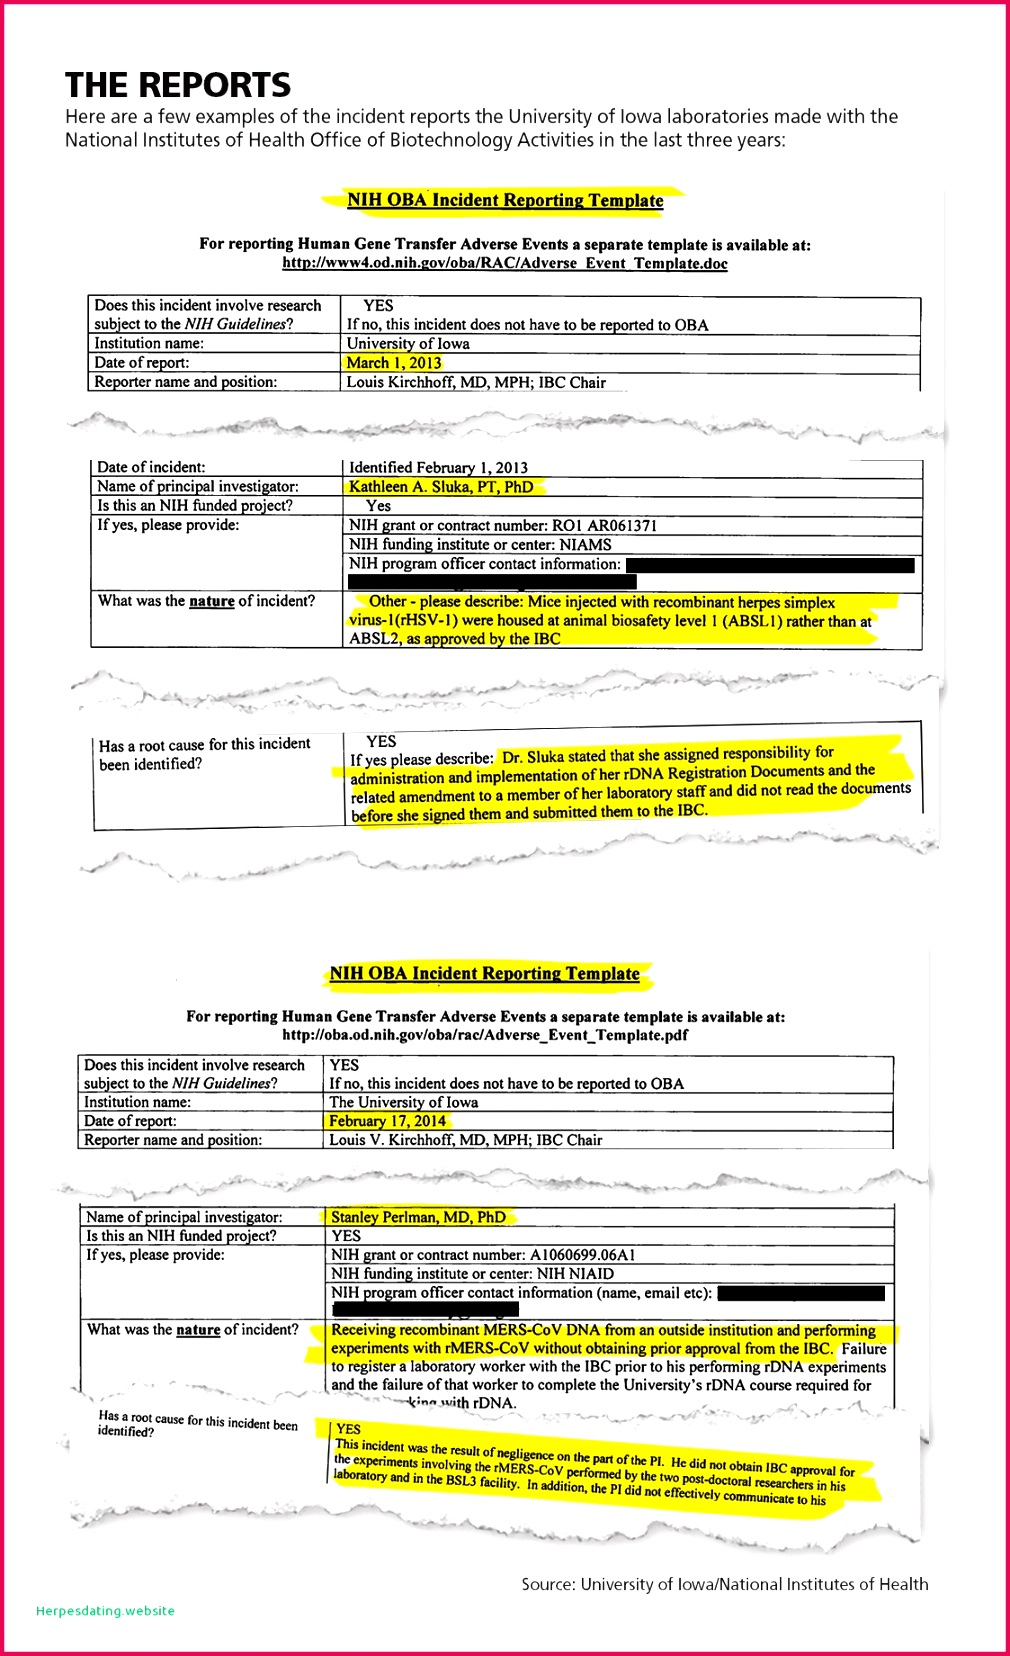 Work Hours Calculator Excel Spreadsheet Fresh Church Tithing Excel Template Elegant Kpi Reporting Template Unique Excel Template for Church Tithes